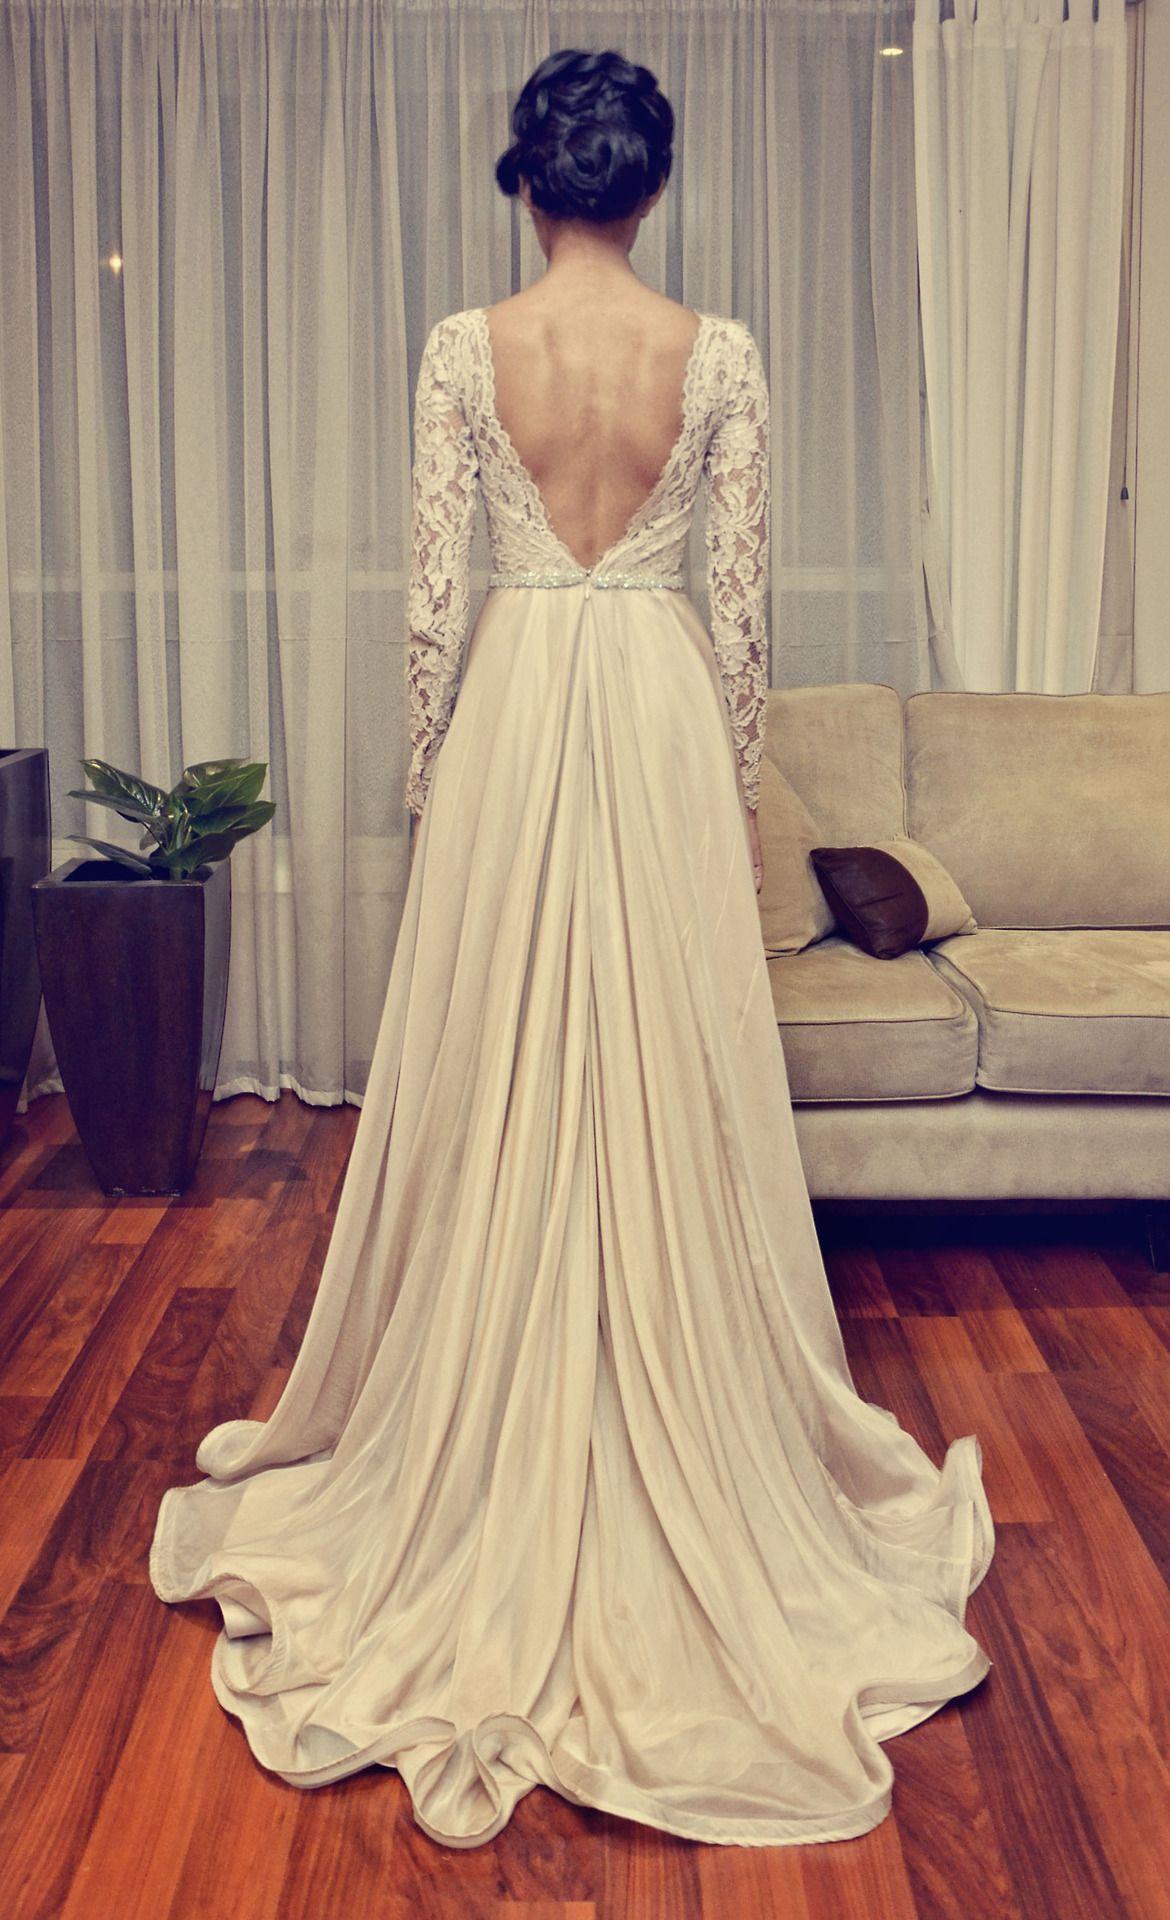 Beautiful Ivory Wedding Dress With Lace Detailing Lange Armel Richtige Lange Der Schleppe Tolle Haa Ivory Wedding Dress Wedding Dresses Lace Wedding Dresses